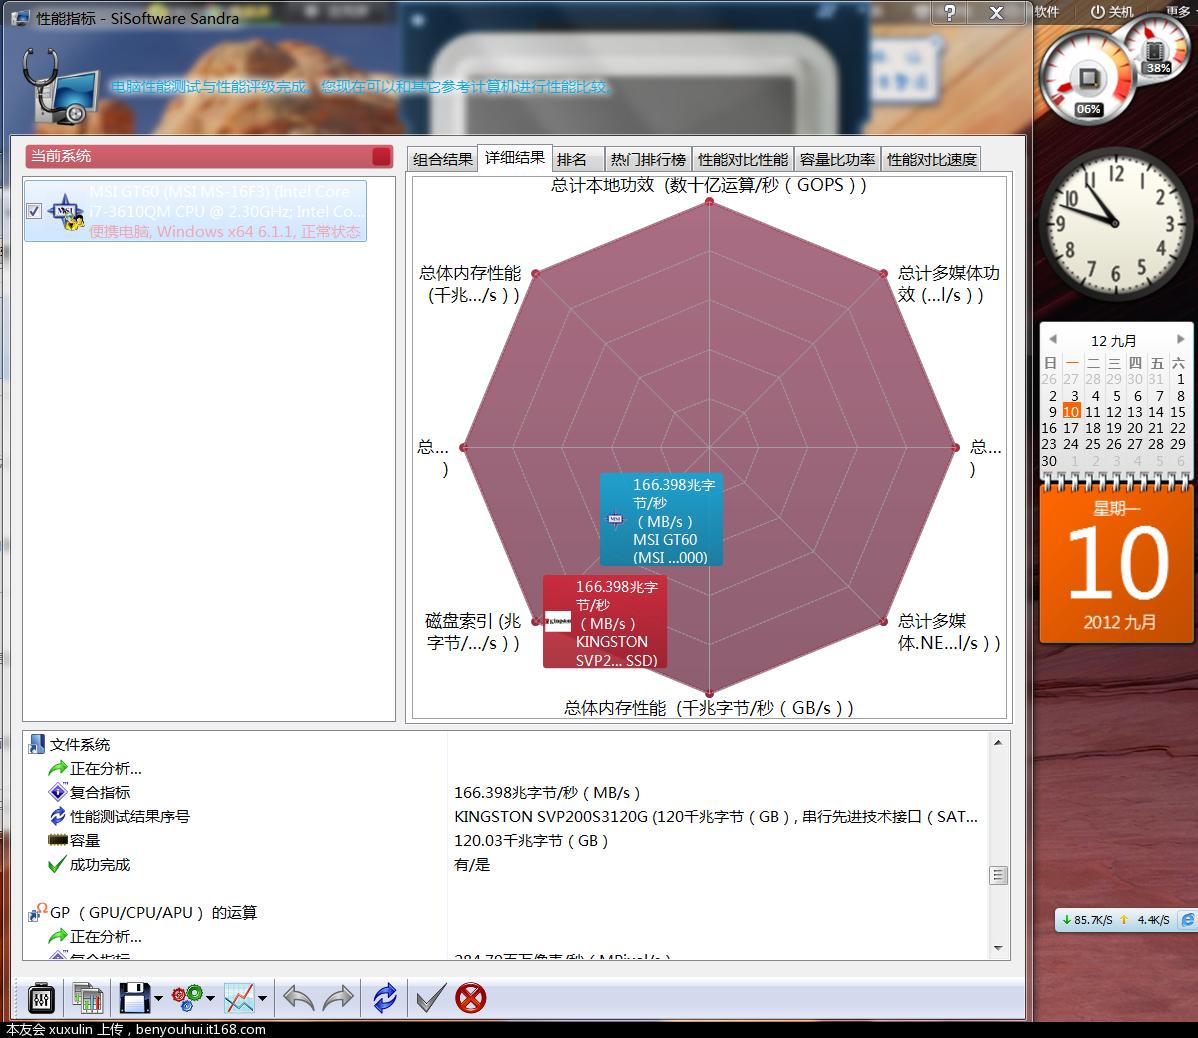 Sisoftware Sandra 截图8.PNG